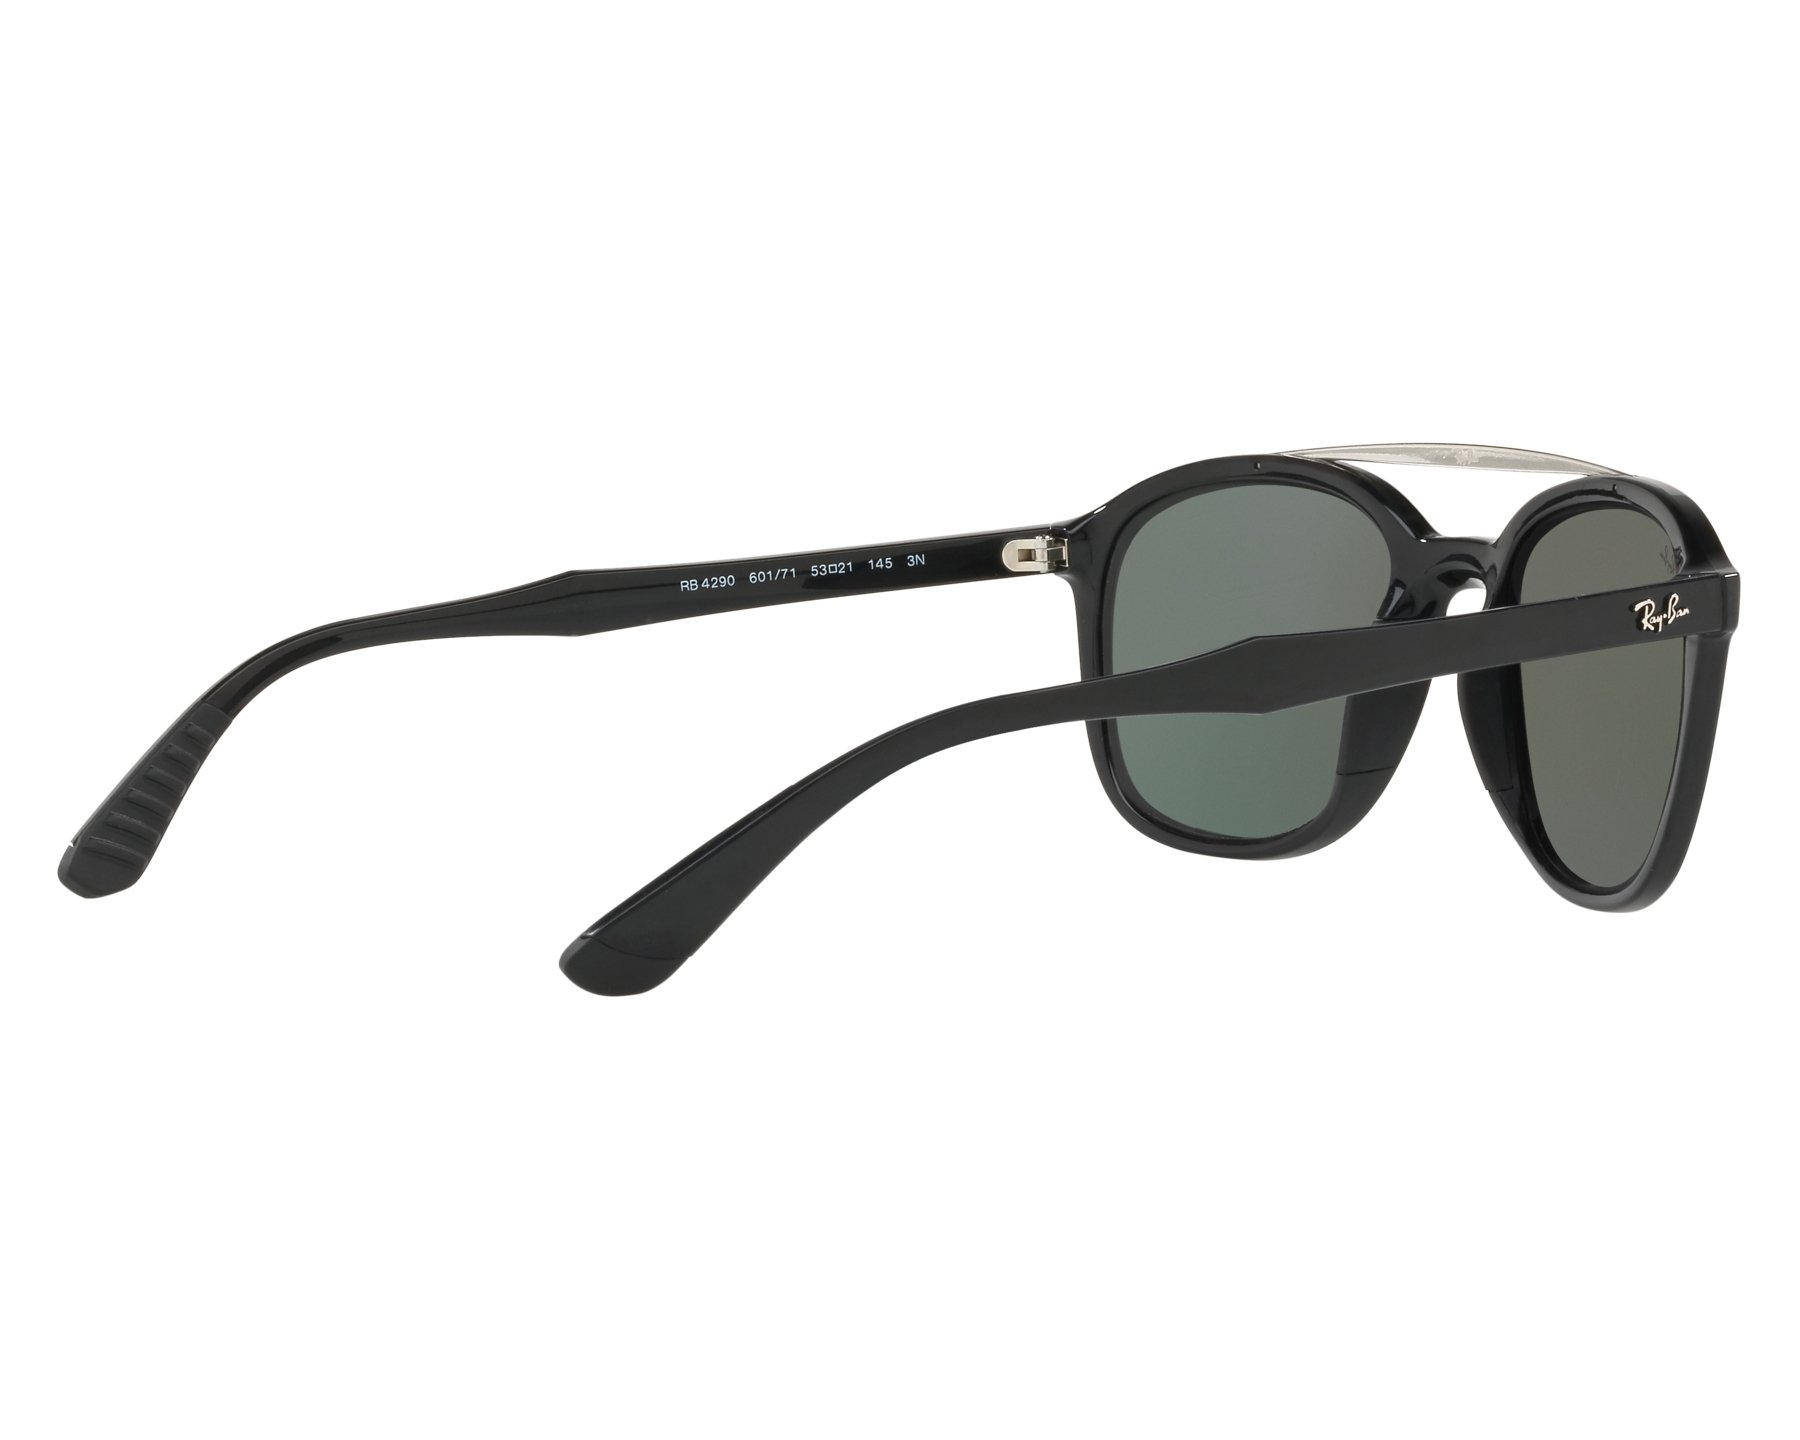 db2f1b1694 Sonnenbrillen Ray-Ban RB-4290 601 71 53-21 schwarz silber 360